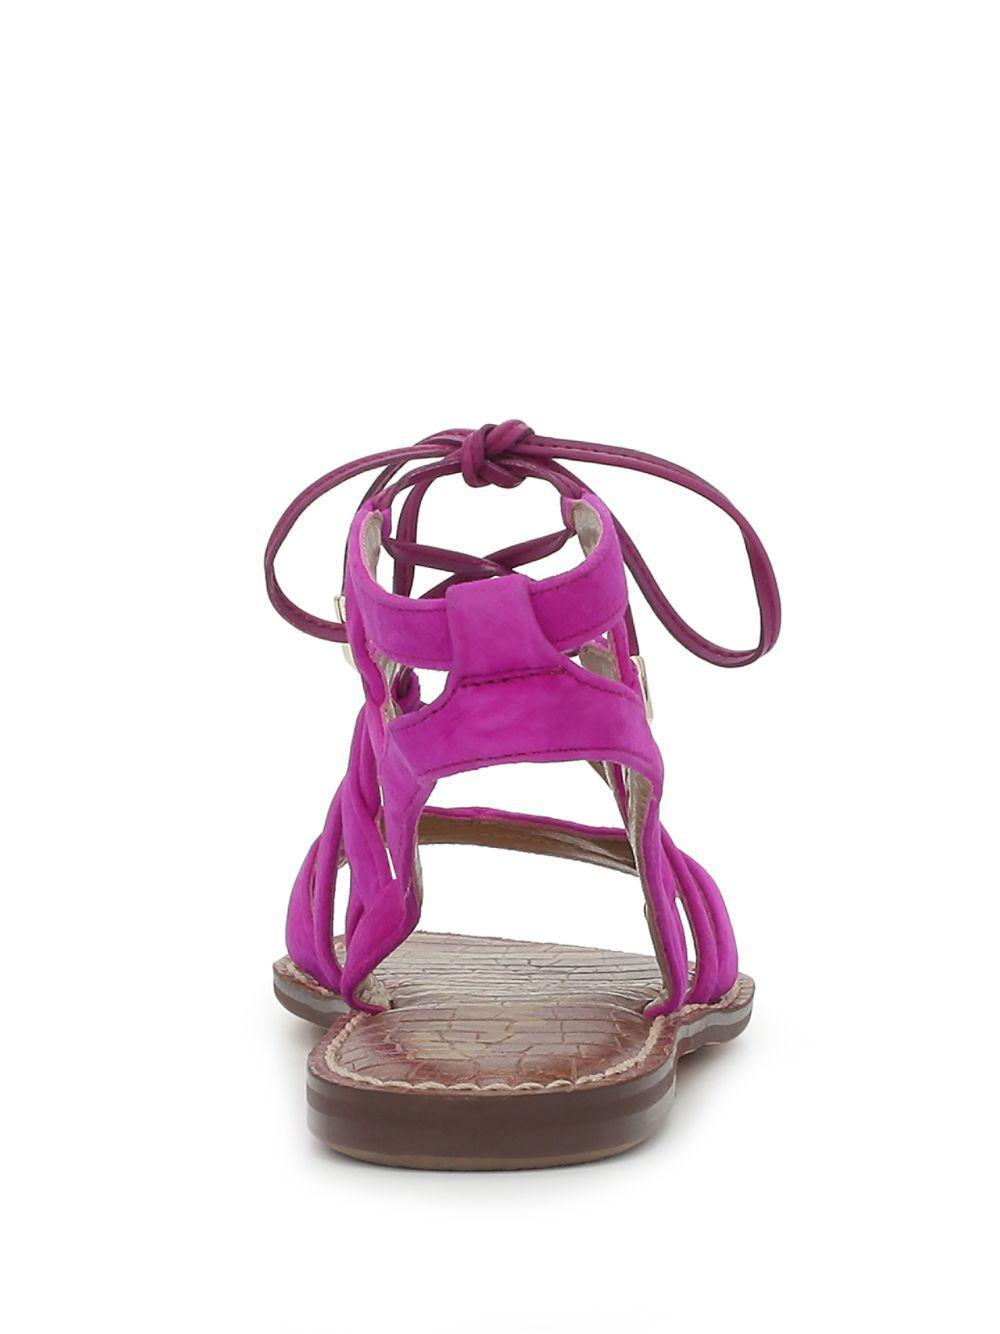 6db2e4ca226 Sam Edelman - Purple Gemma Sandal Fuchsia Suede - Lyst. View fullscreen